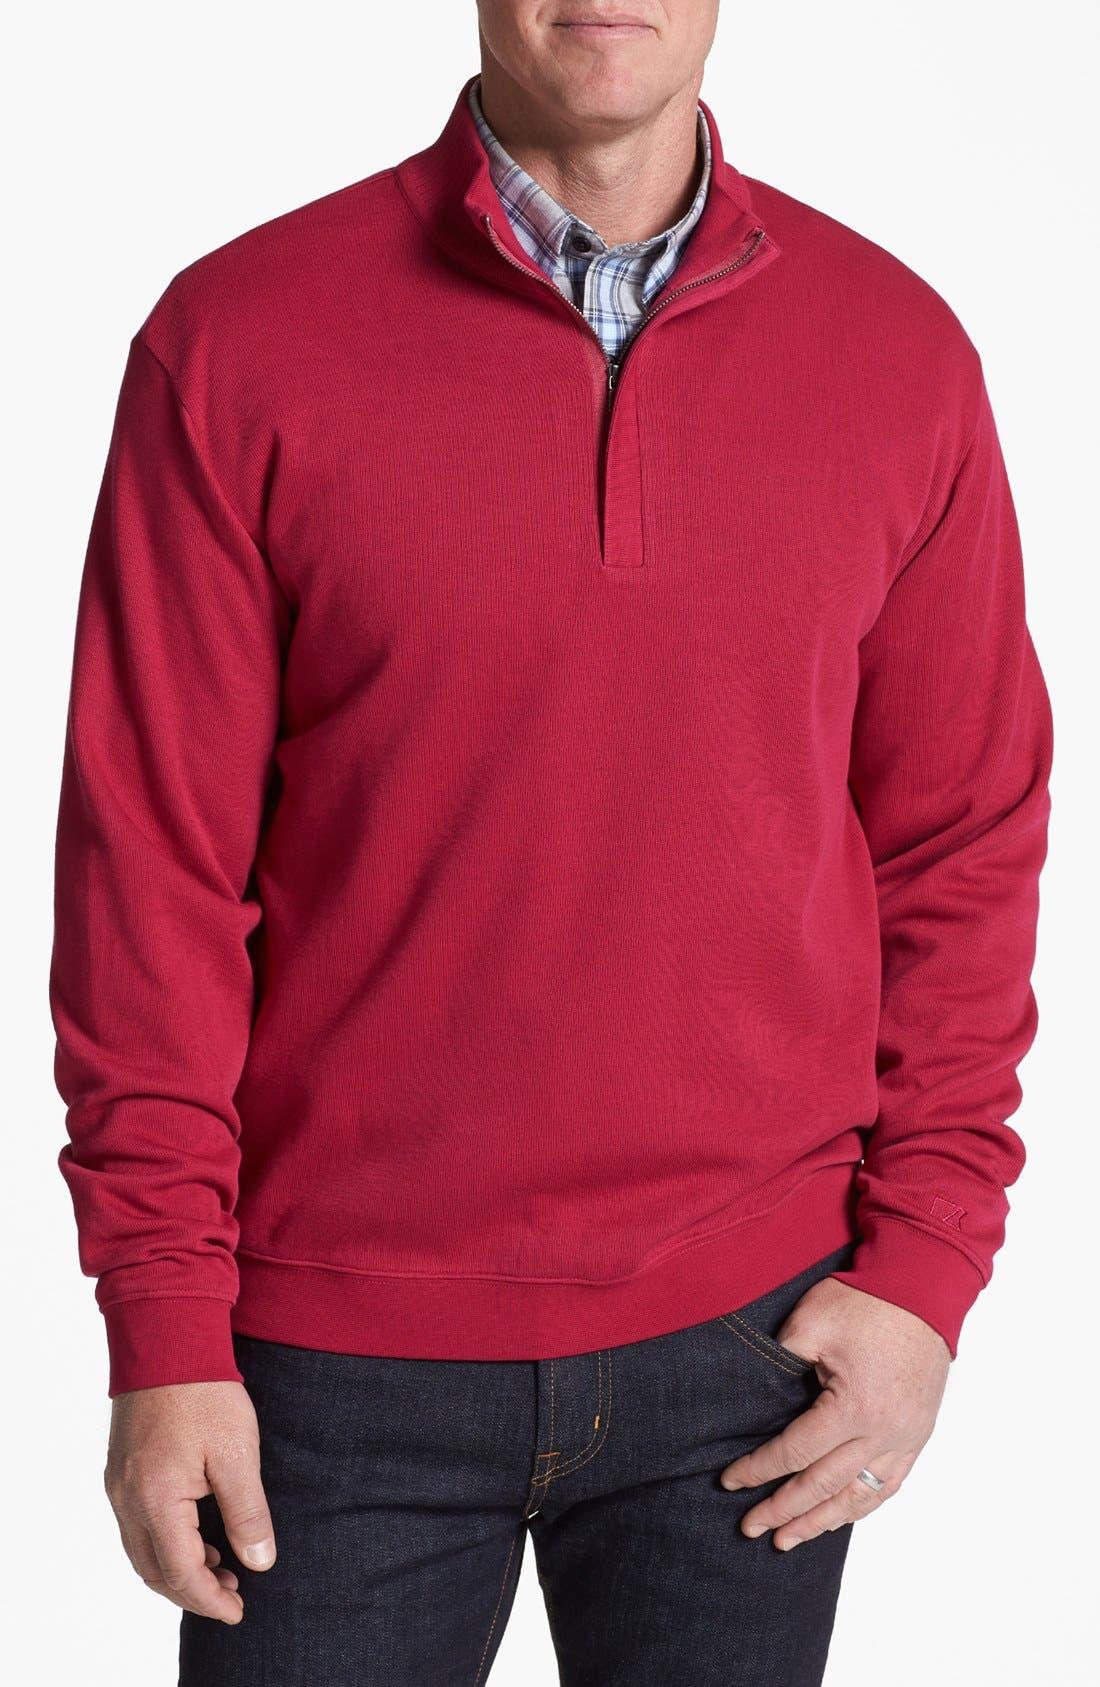 Main Image - Cutter & Buck 'Flatback' Pullover Sweatshirt